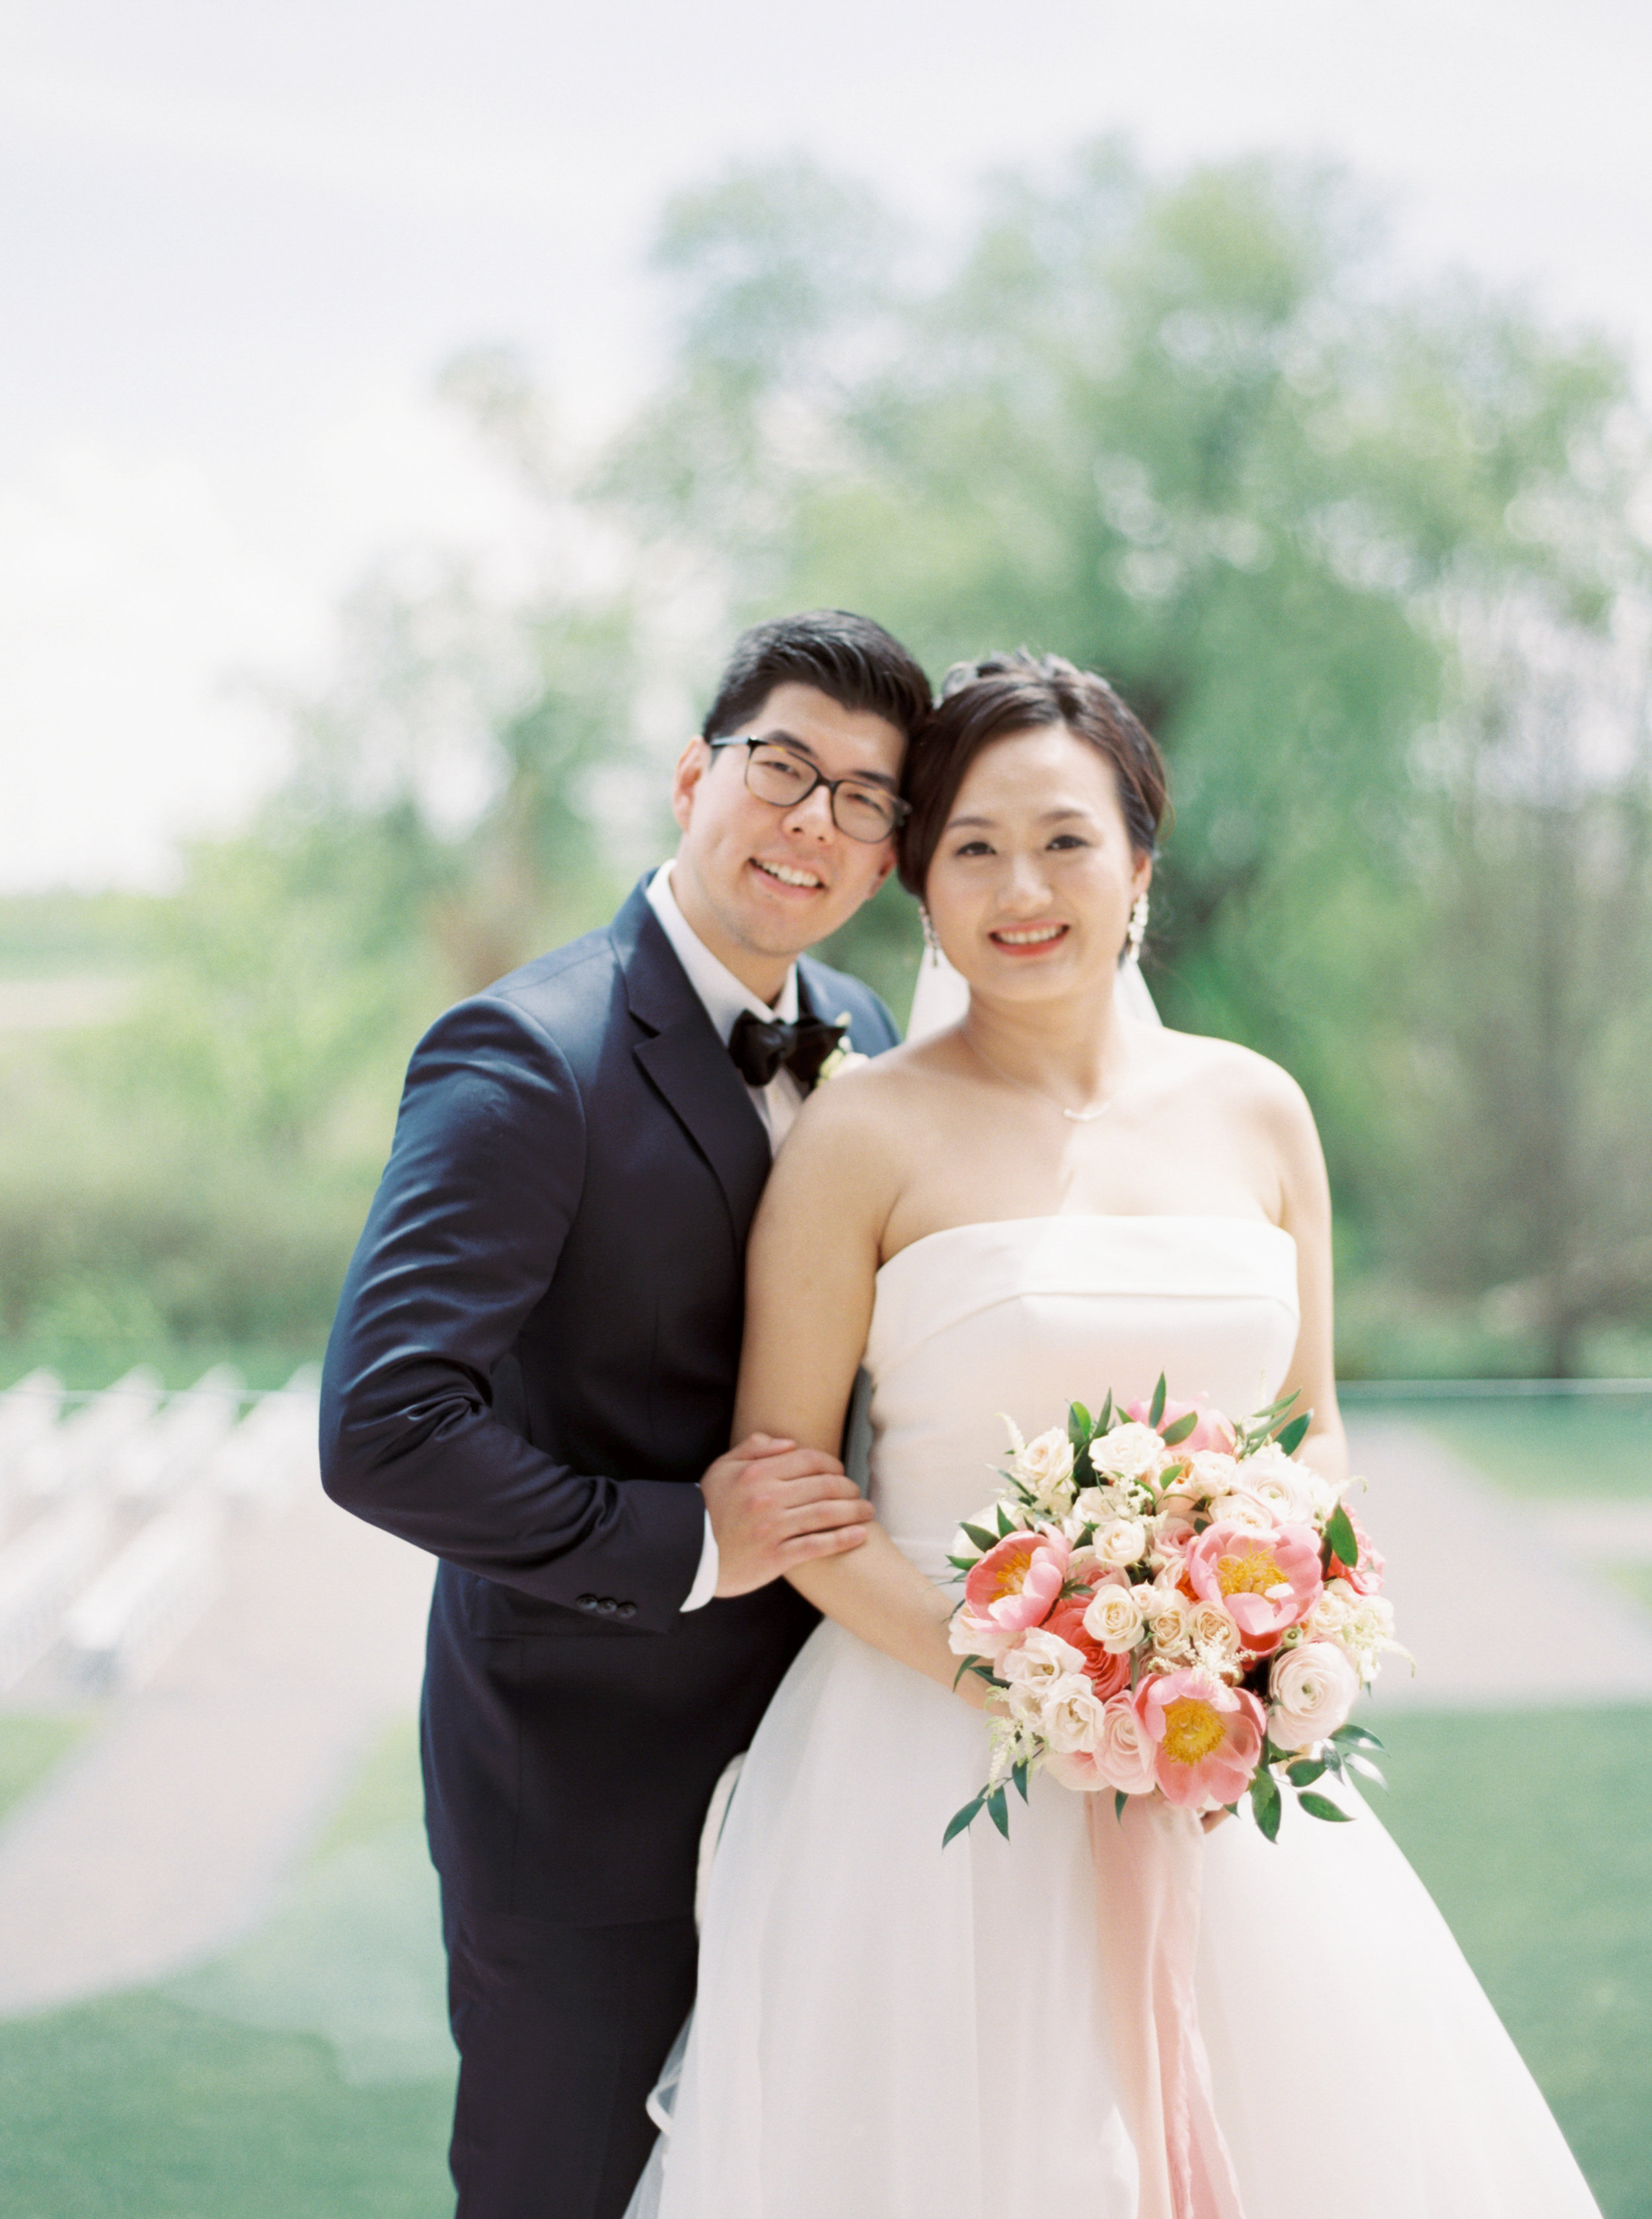 Arlington Estate Wedding - Bridal Portraits-21.jpg